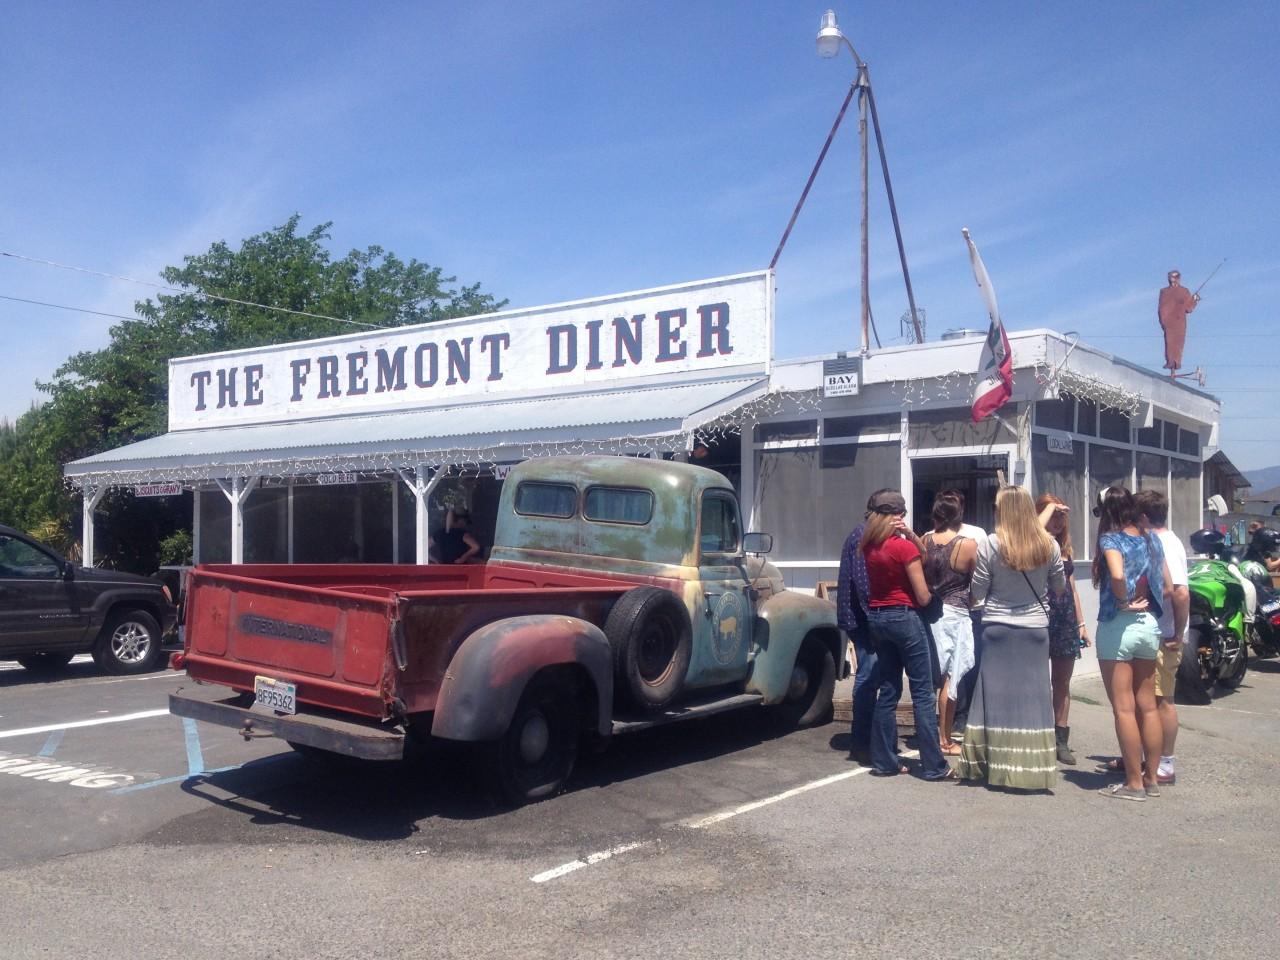 Sonoma's Retro-Fabulous FremontDiner